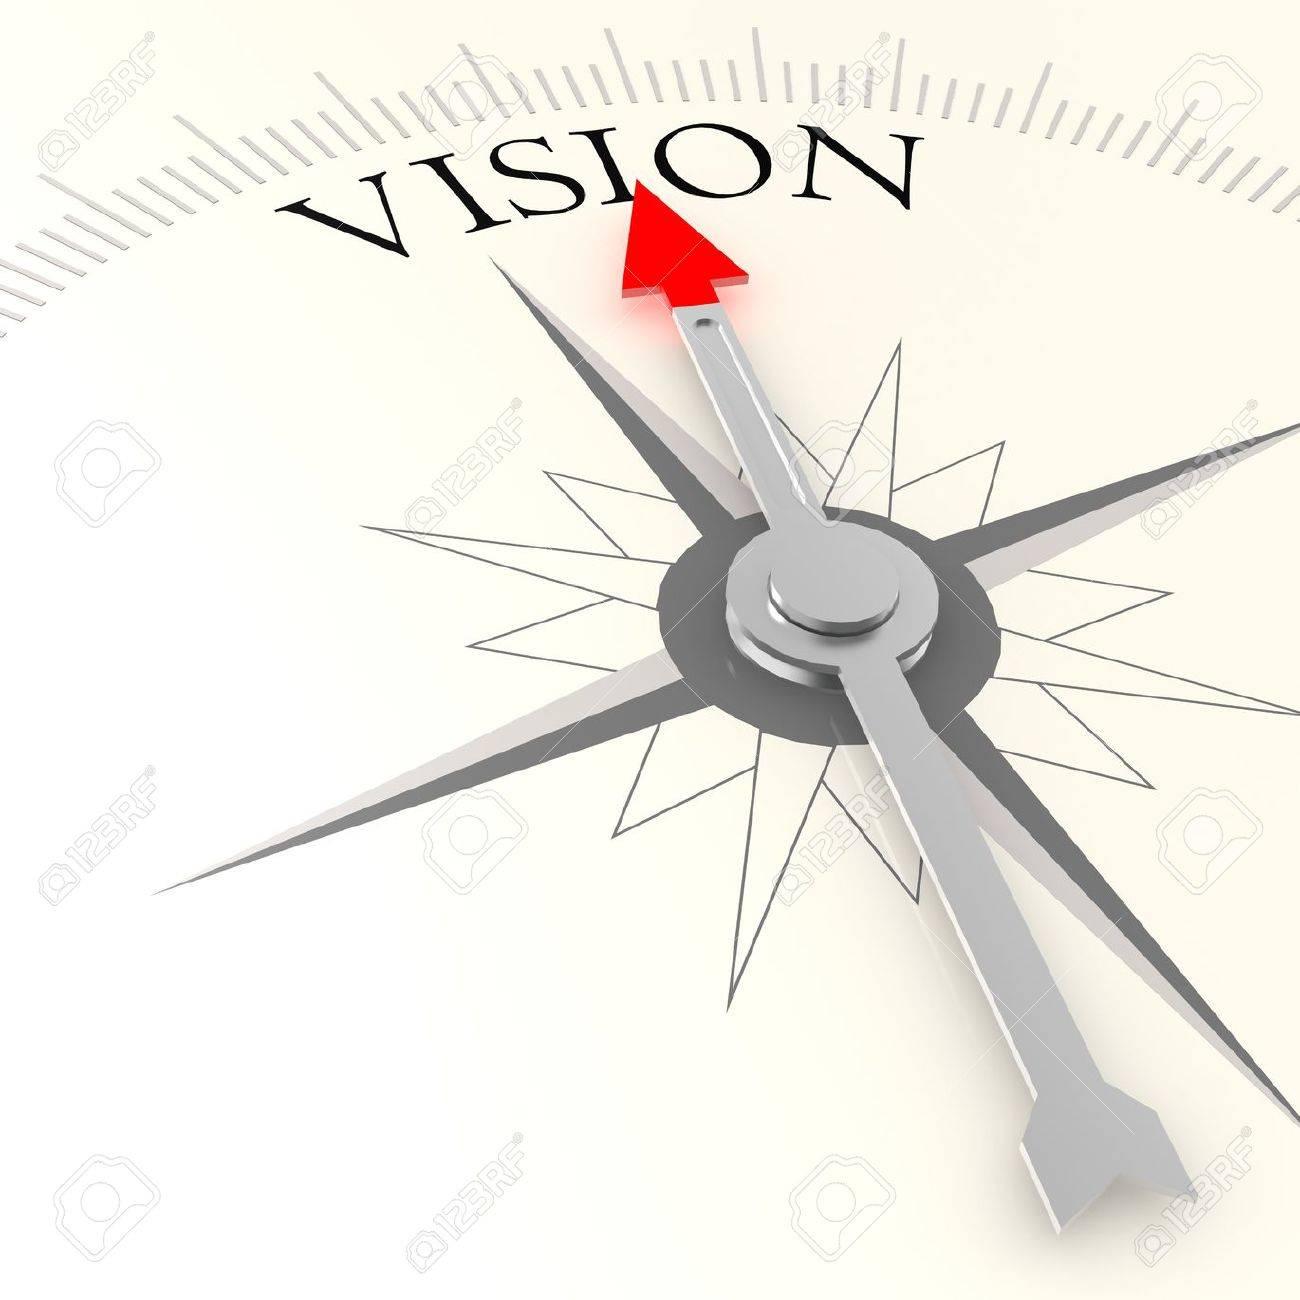 Vision campass - 34064309